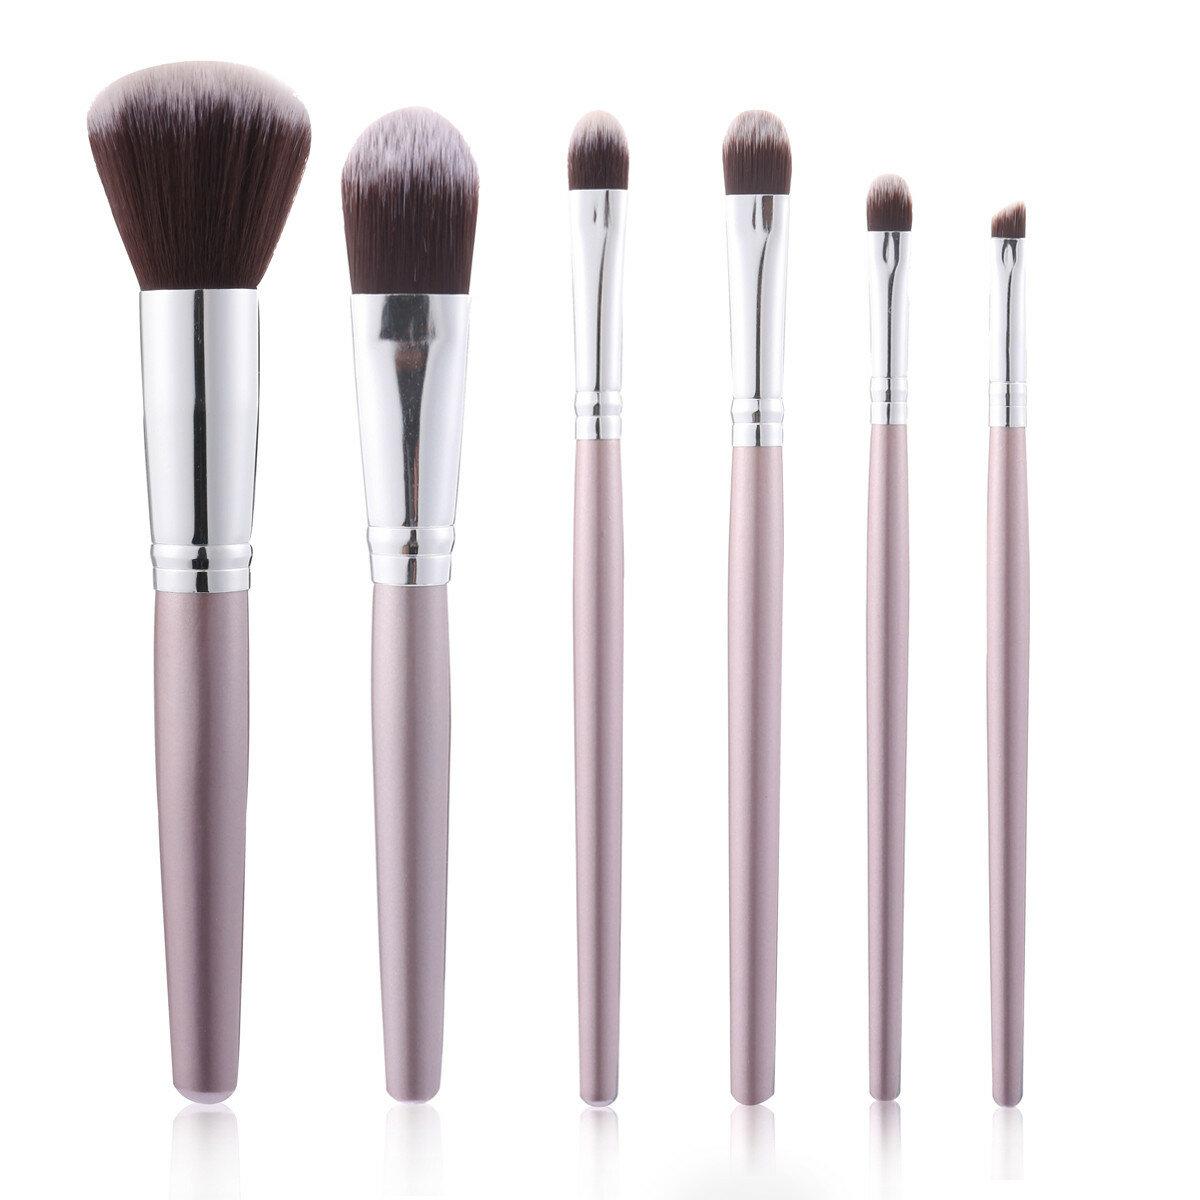 6Pcs Makeup Brushes Set Eye Shadow Foundation Blend Lips Liner Powder Cosmetics Tool